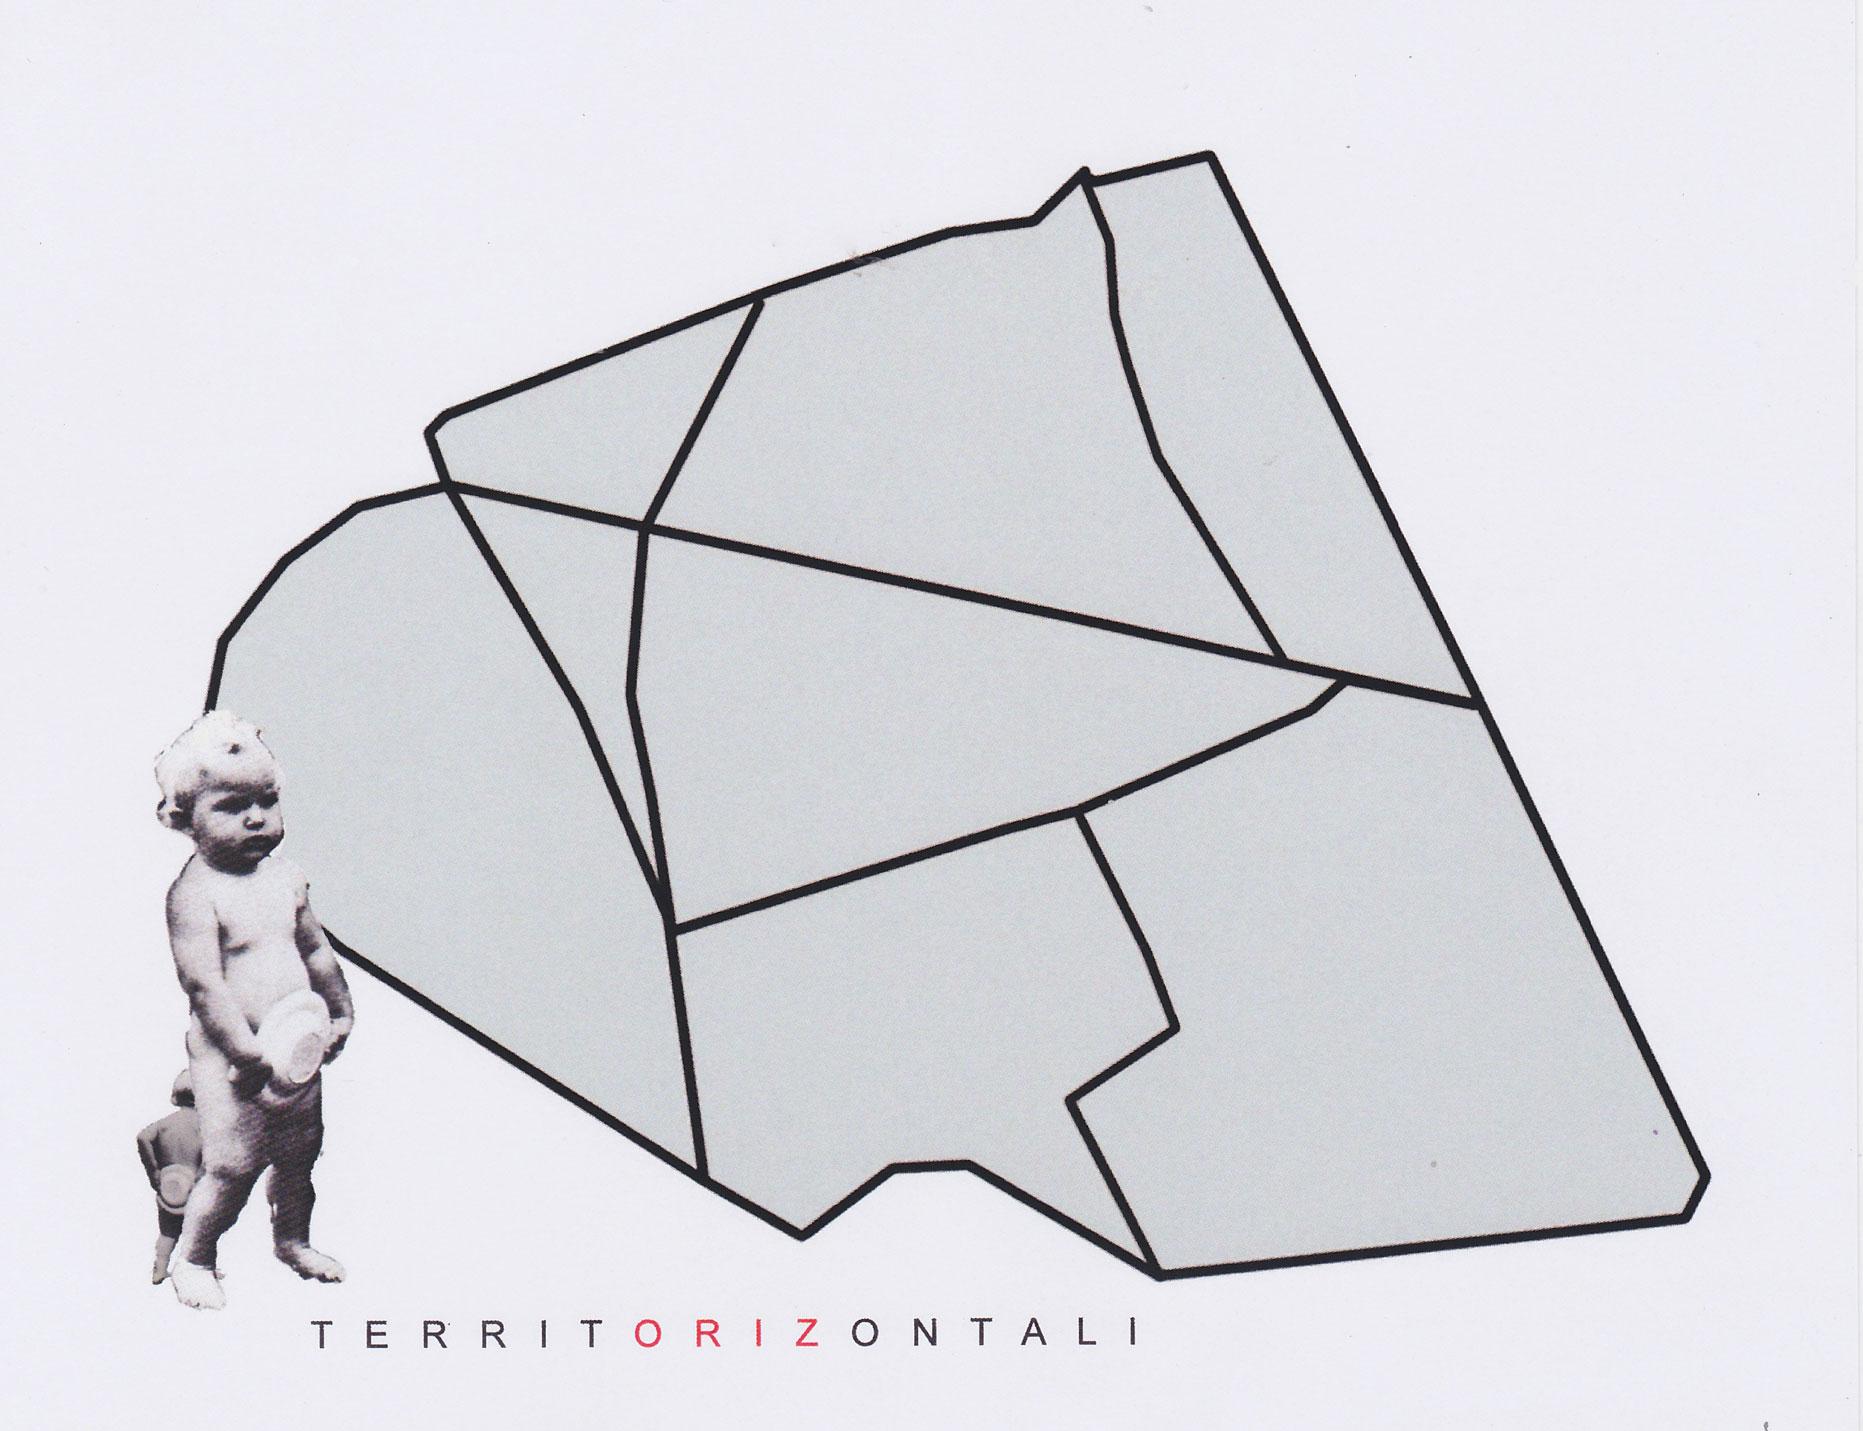 territorizzontali